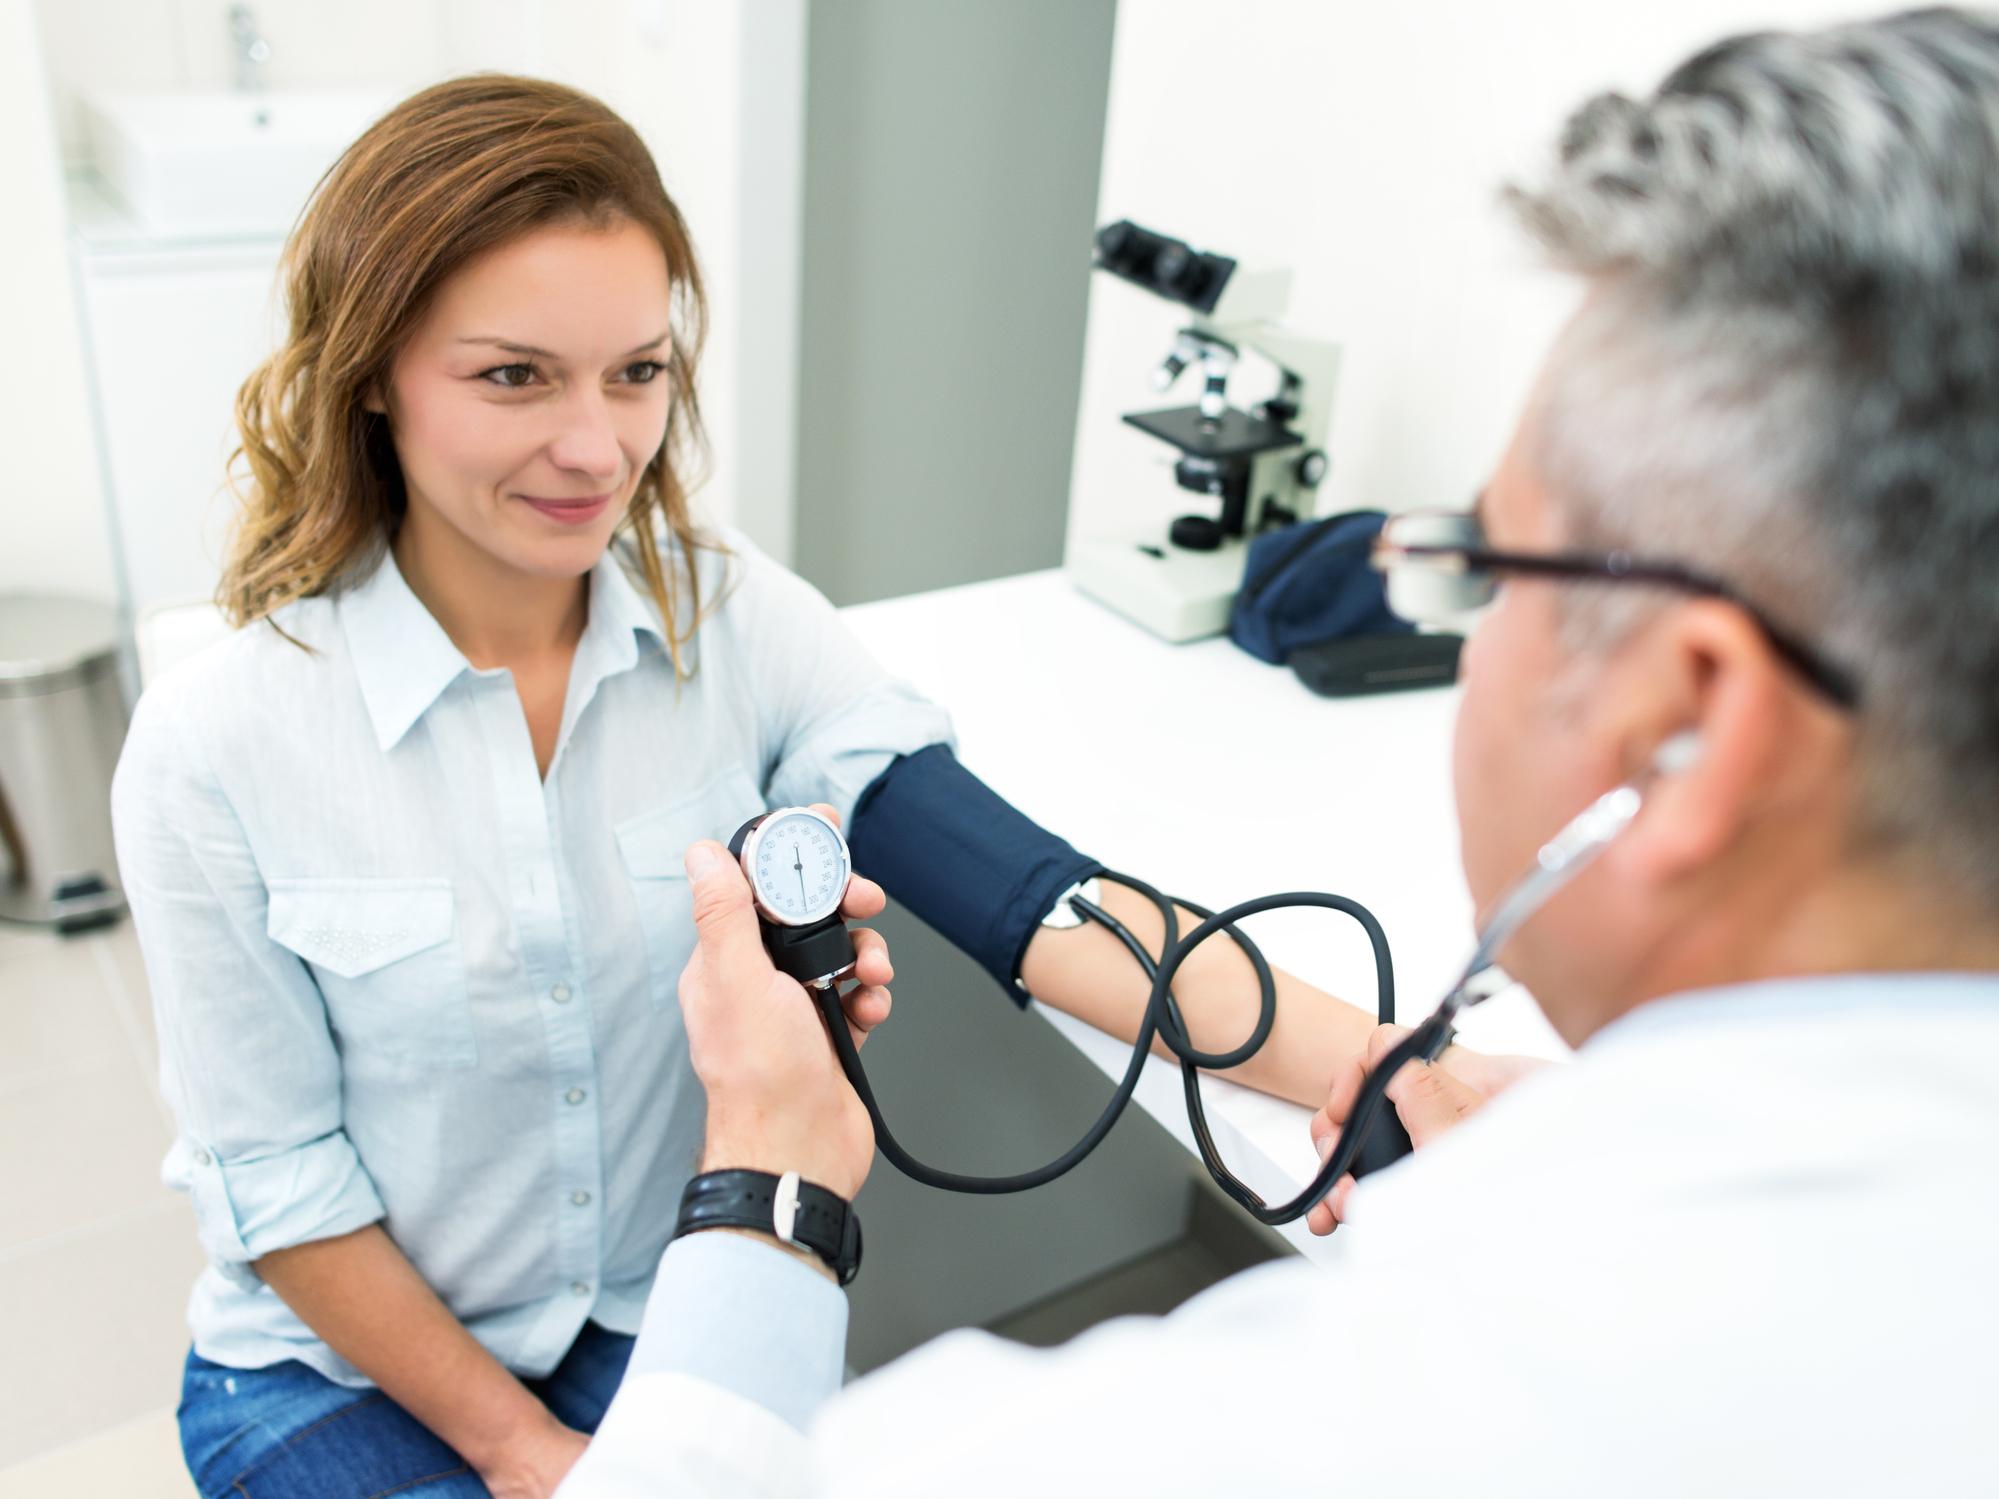 hidzsma magas vérnyomás esetén